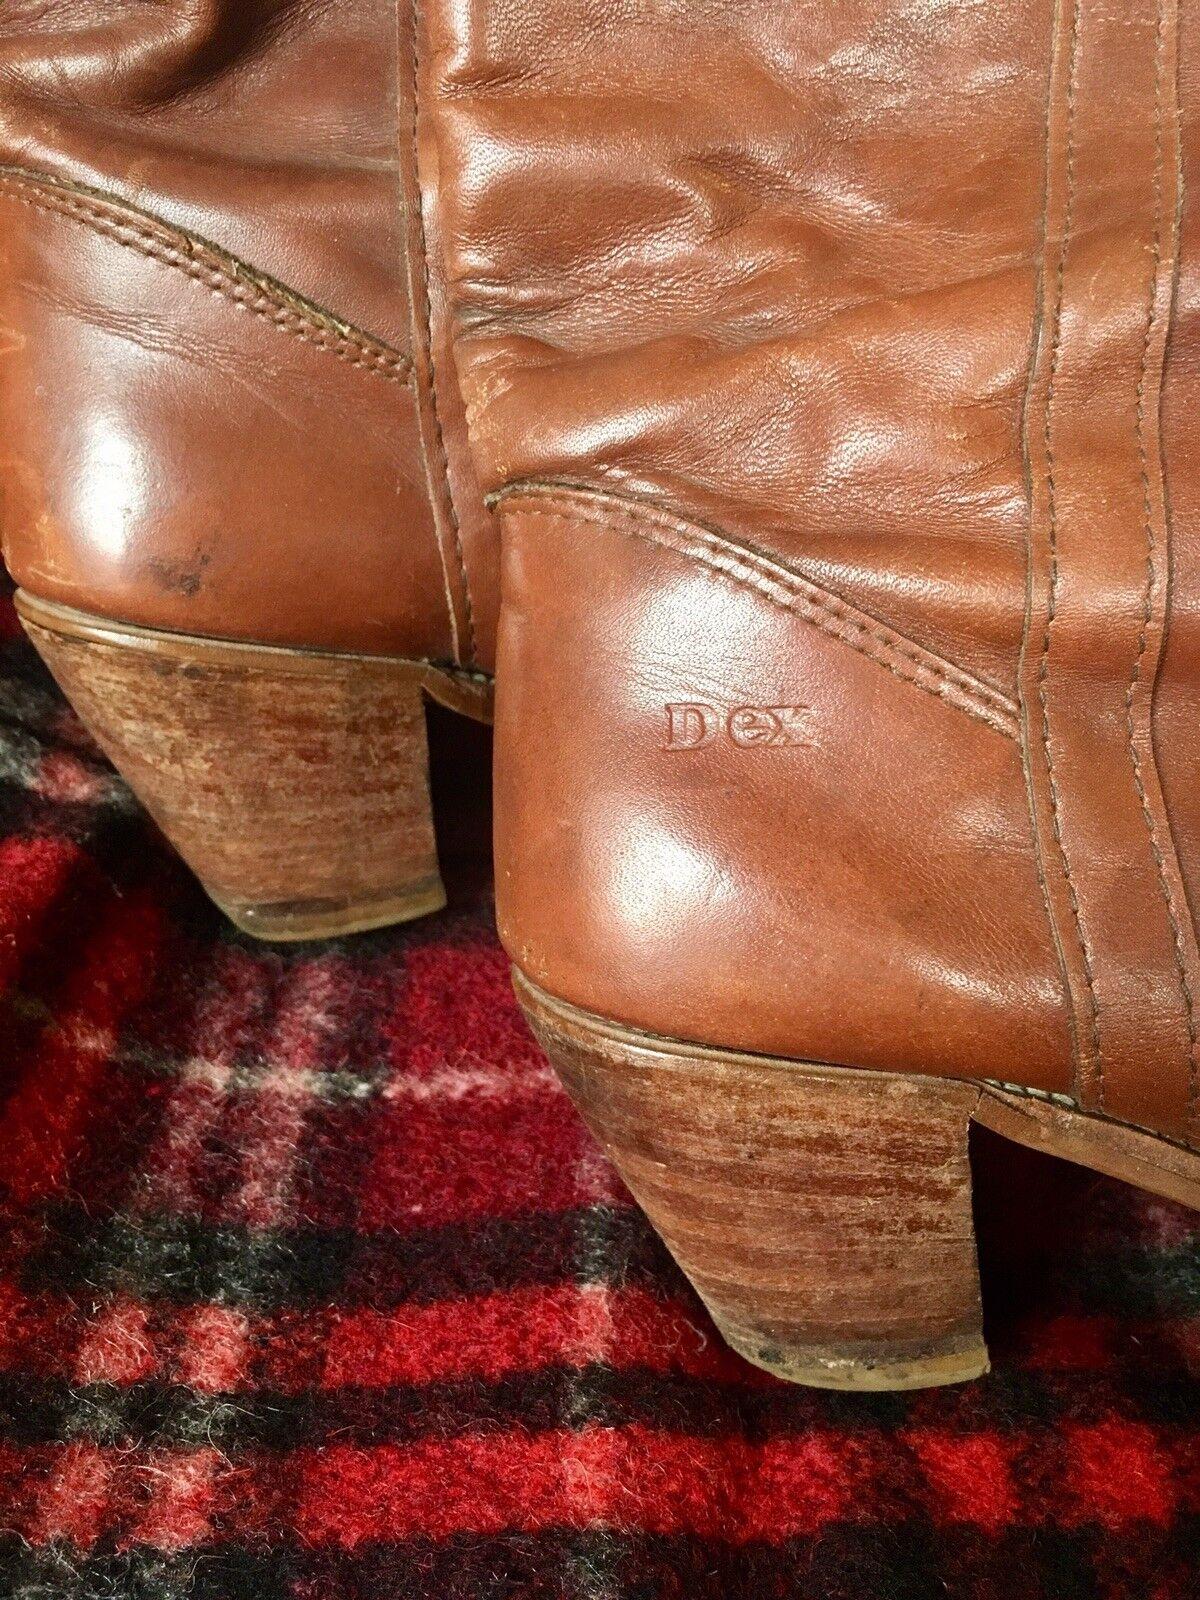 Vintage Dexter Stiefel Knee High Cognac Braun Cognac High Leder Riding / Cowgirl Sz 8 450a36